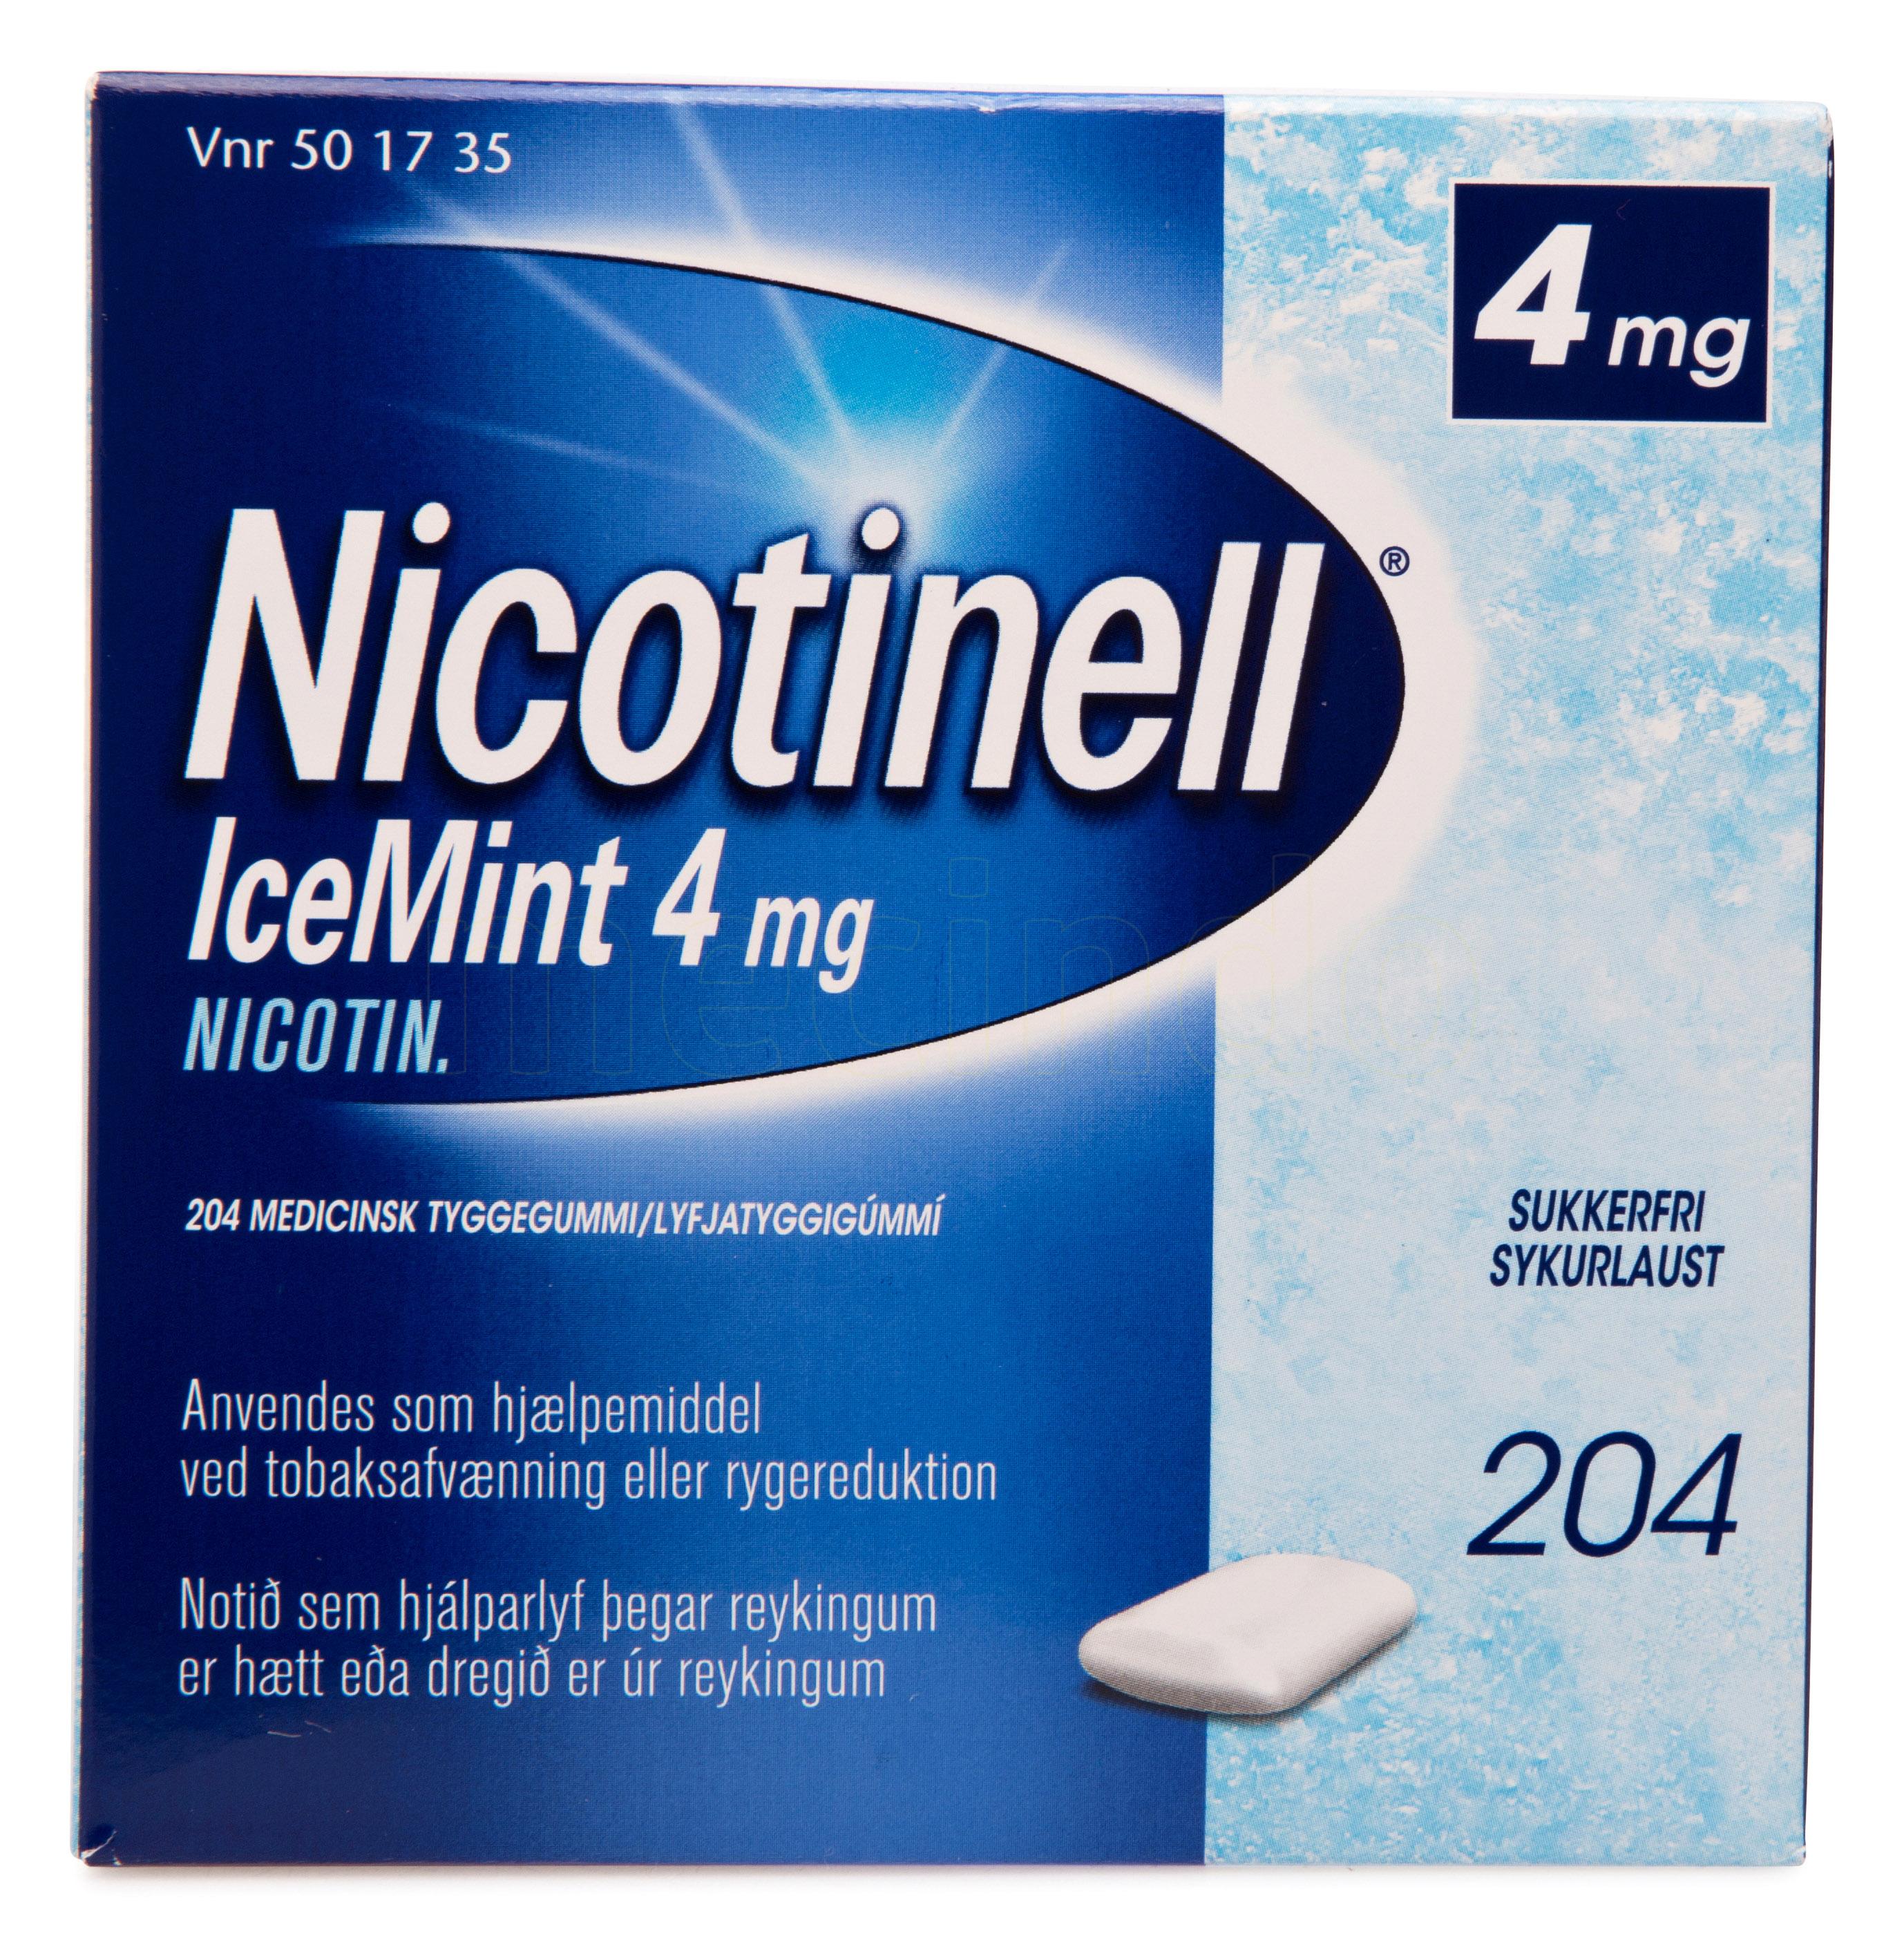 Billede af Nicotinell Tyggegummi IceMint - 4 mg - 204 Stk.